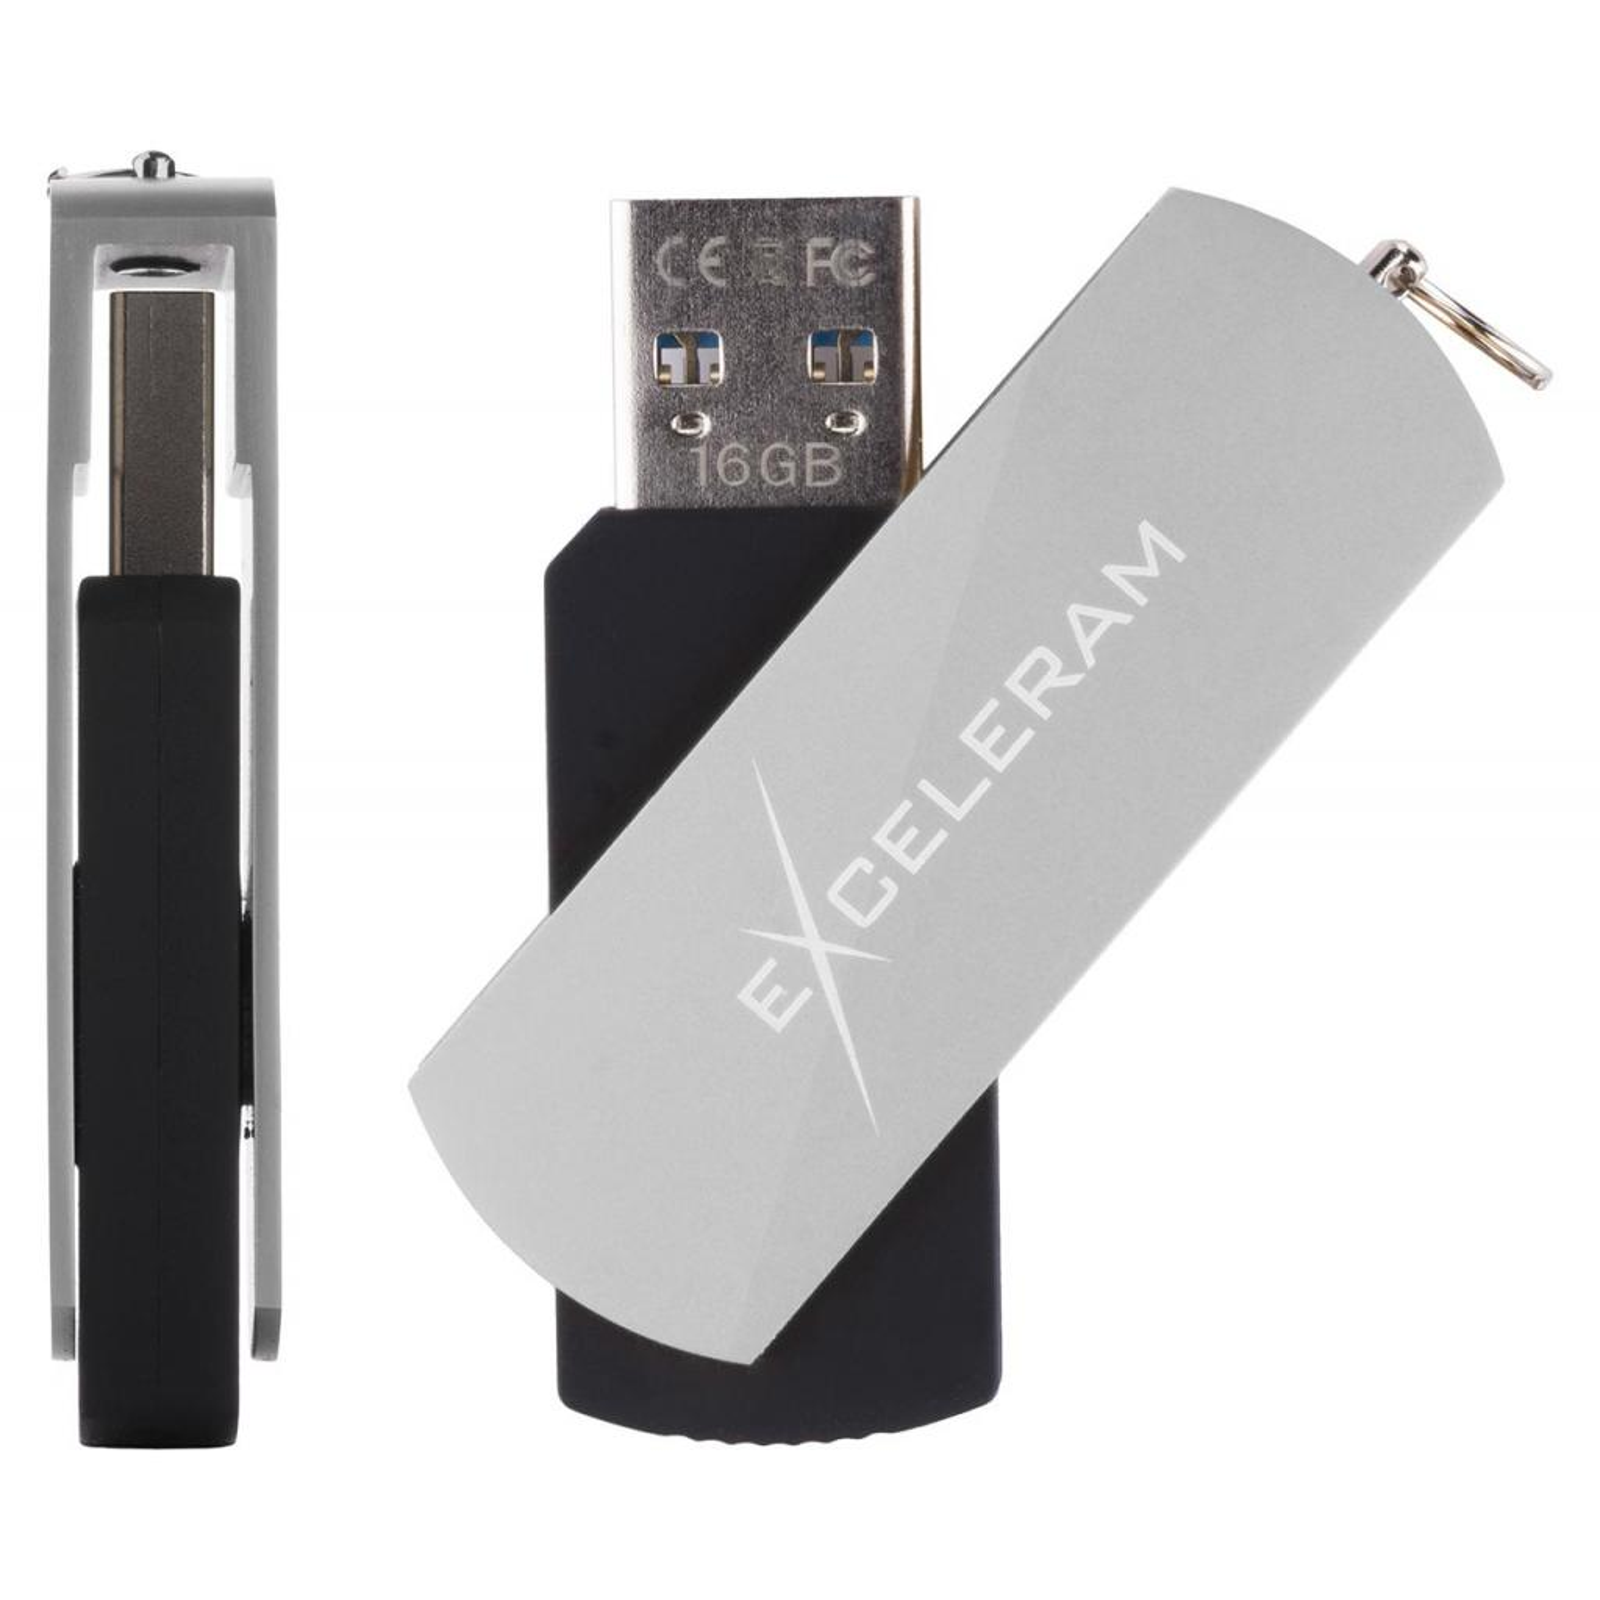 USB флеш накопитель eXceleram 128GB P2 Series Silver/Black USB 3.1 Gen 1 (EXP2U3SIB128) изображение 4